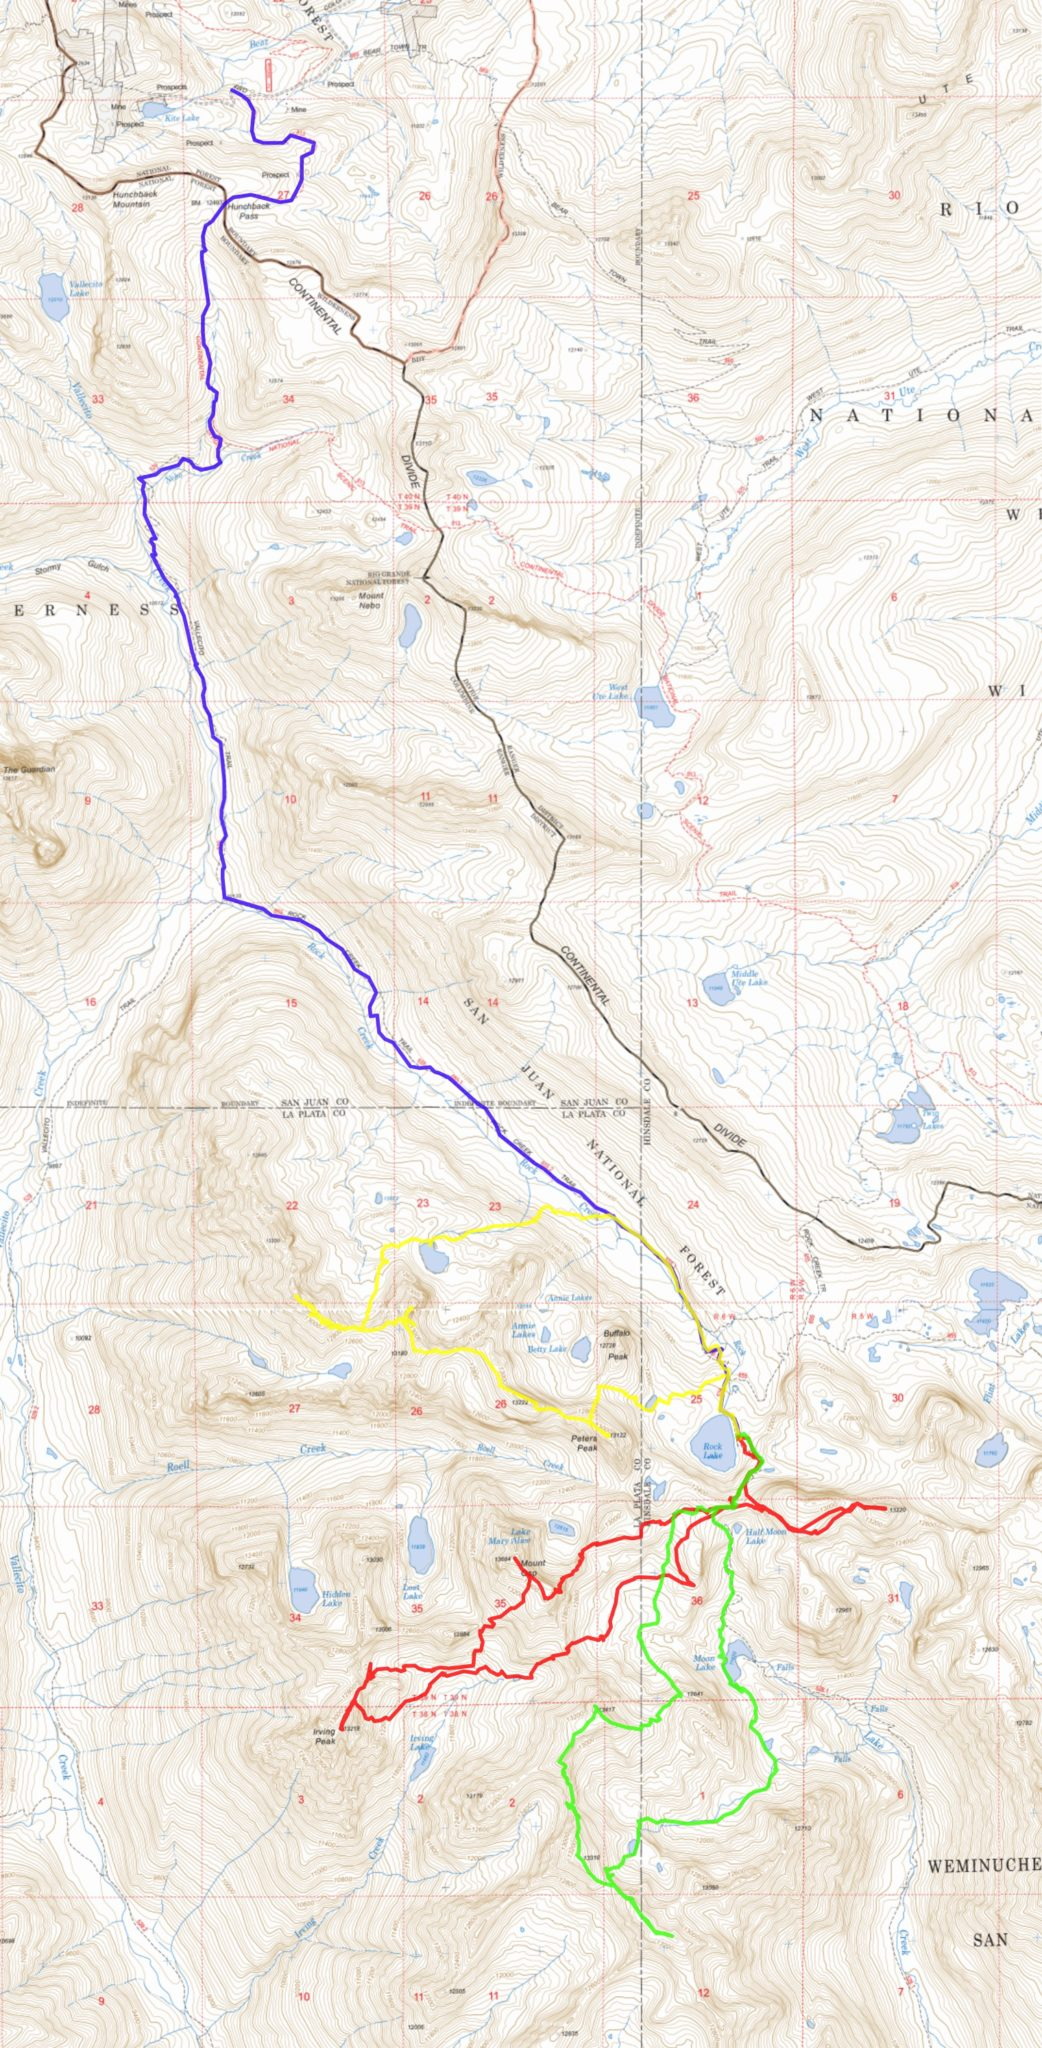 Laboring in the Weminuche: Rock Lake 13ers - Exploring the Rockies